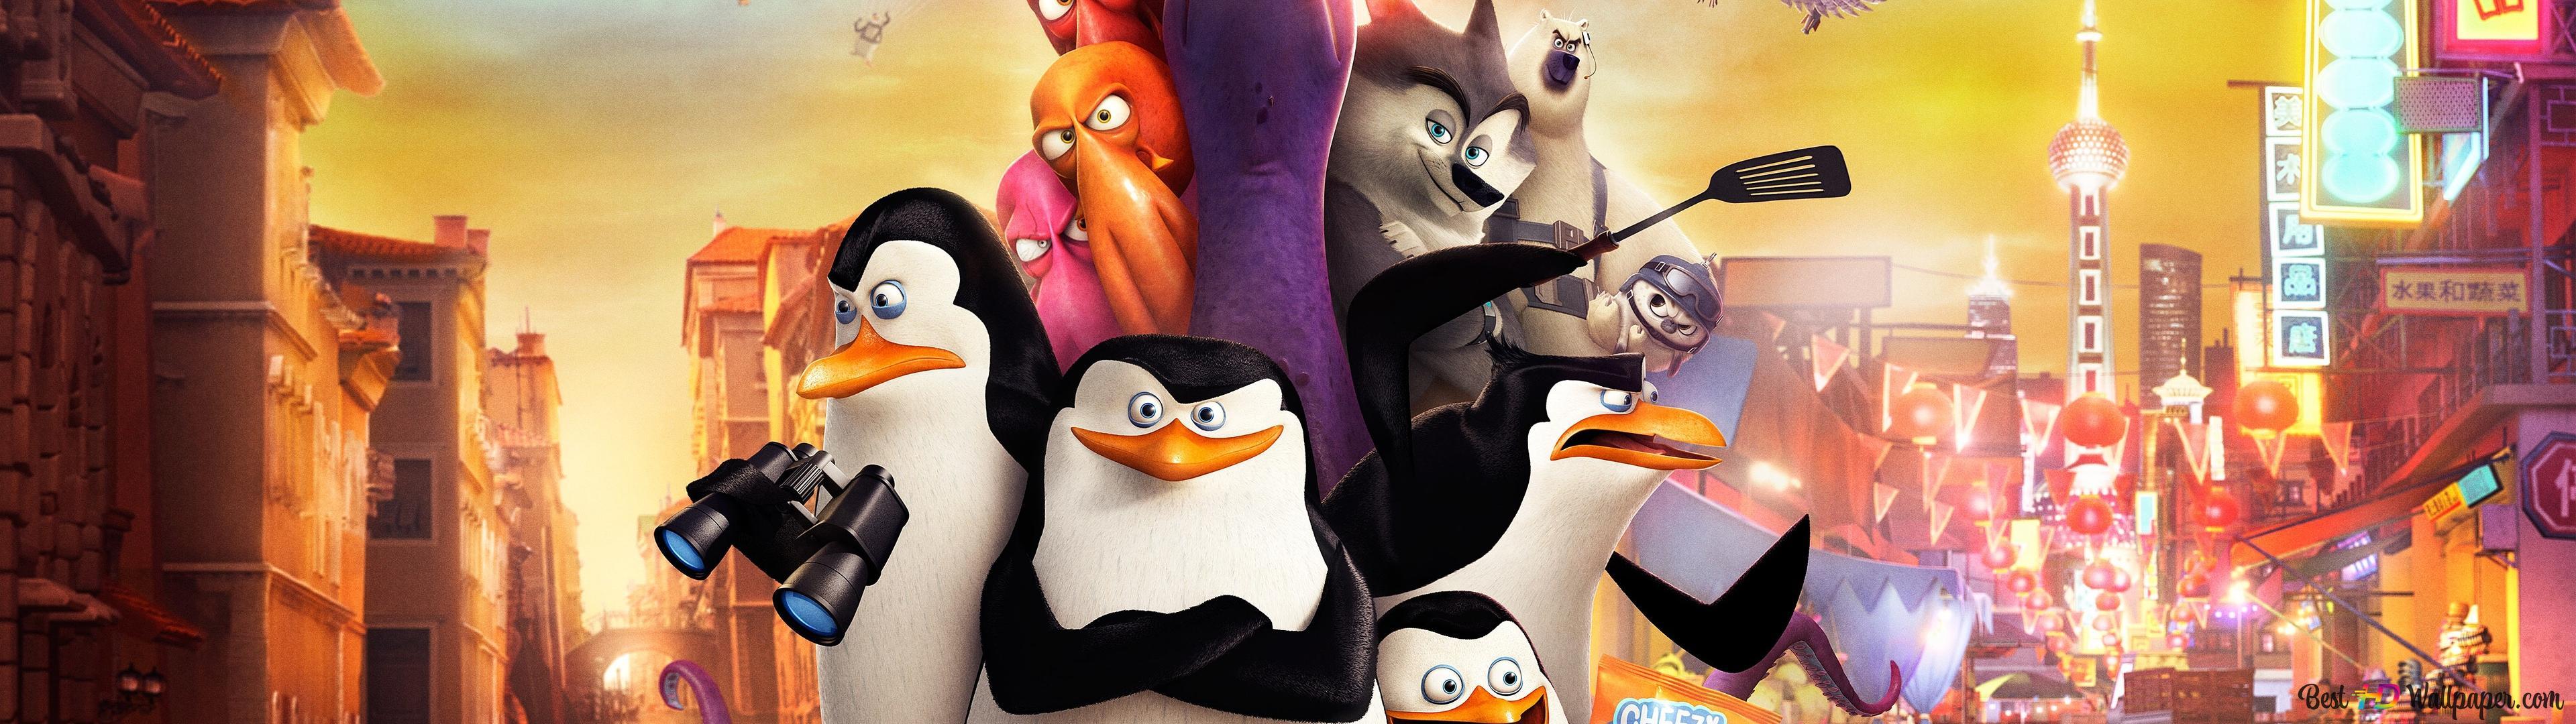 Penguins Of Madagascar 2014 Hd Wallpaper Download